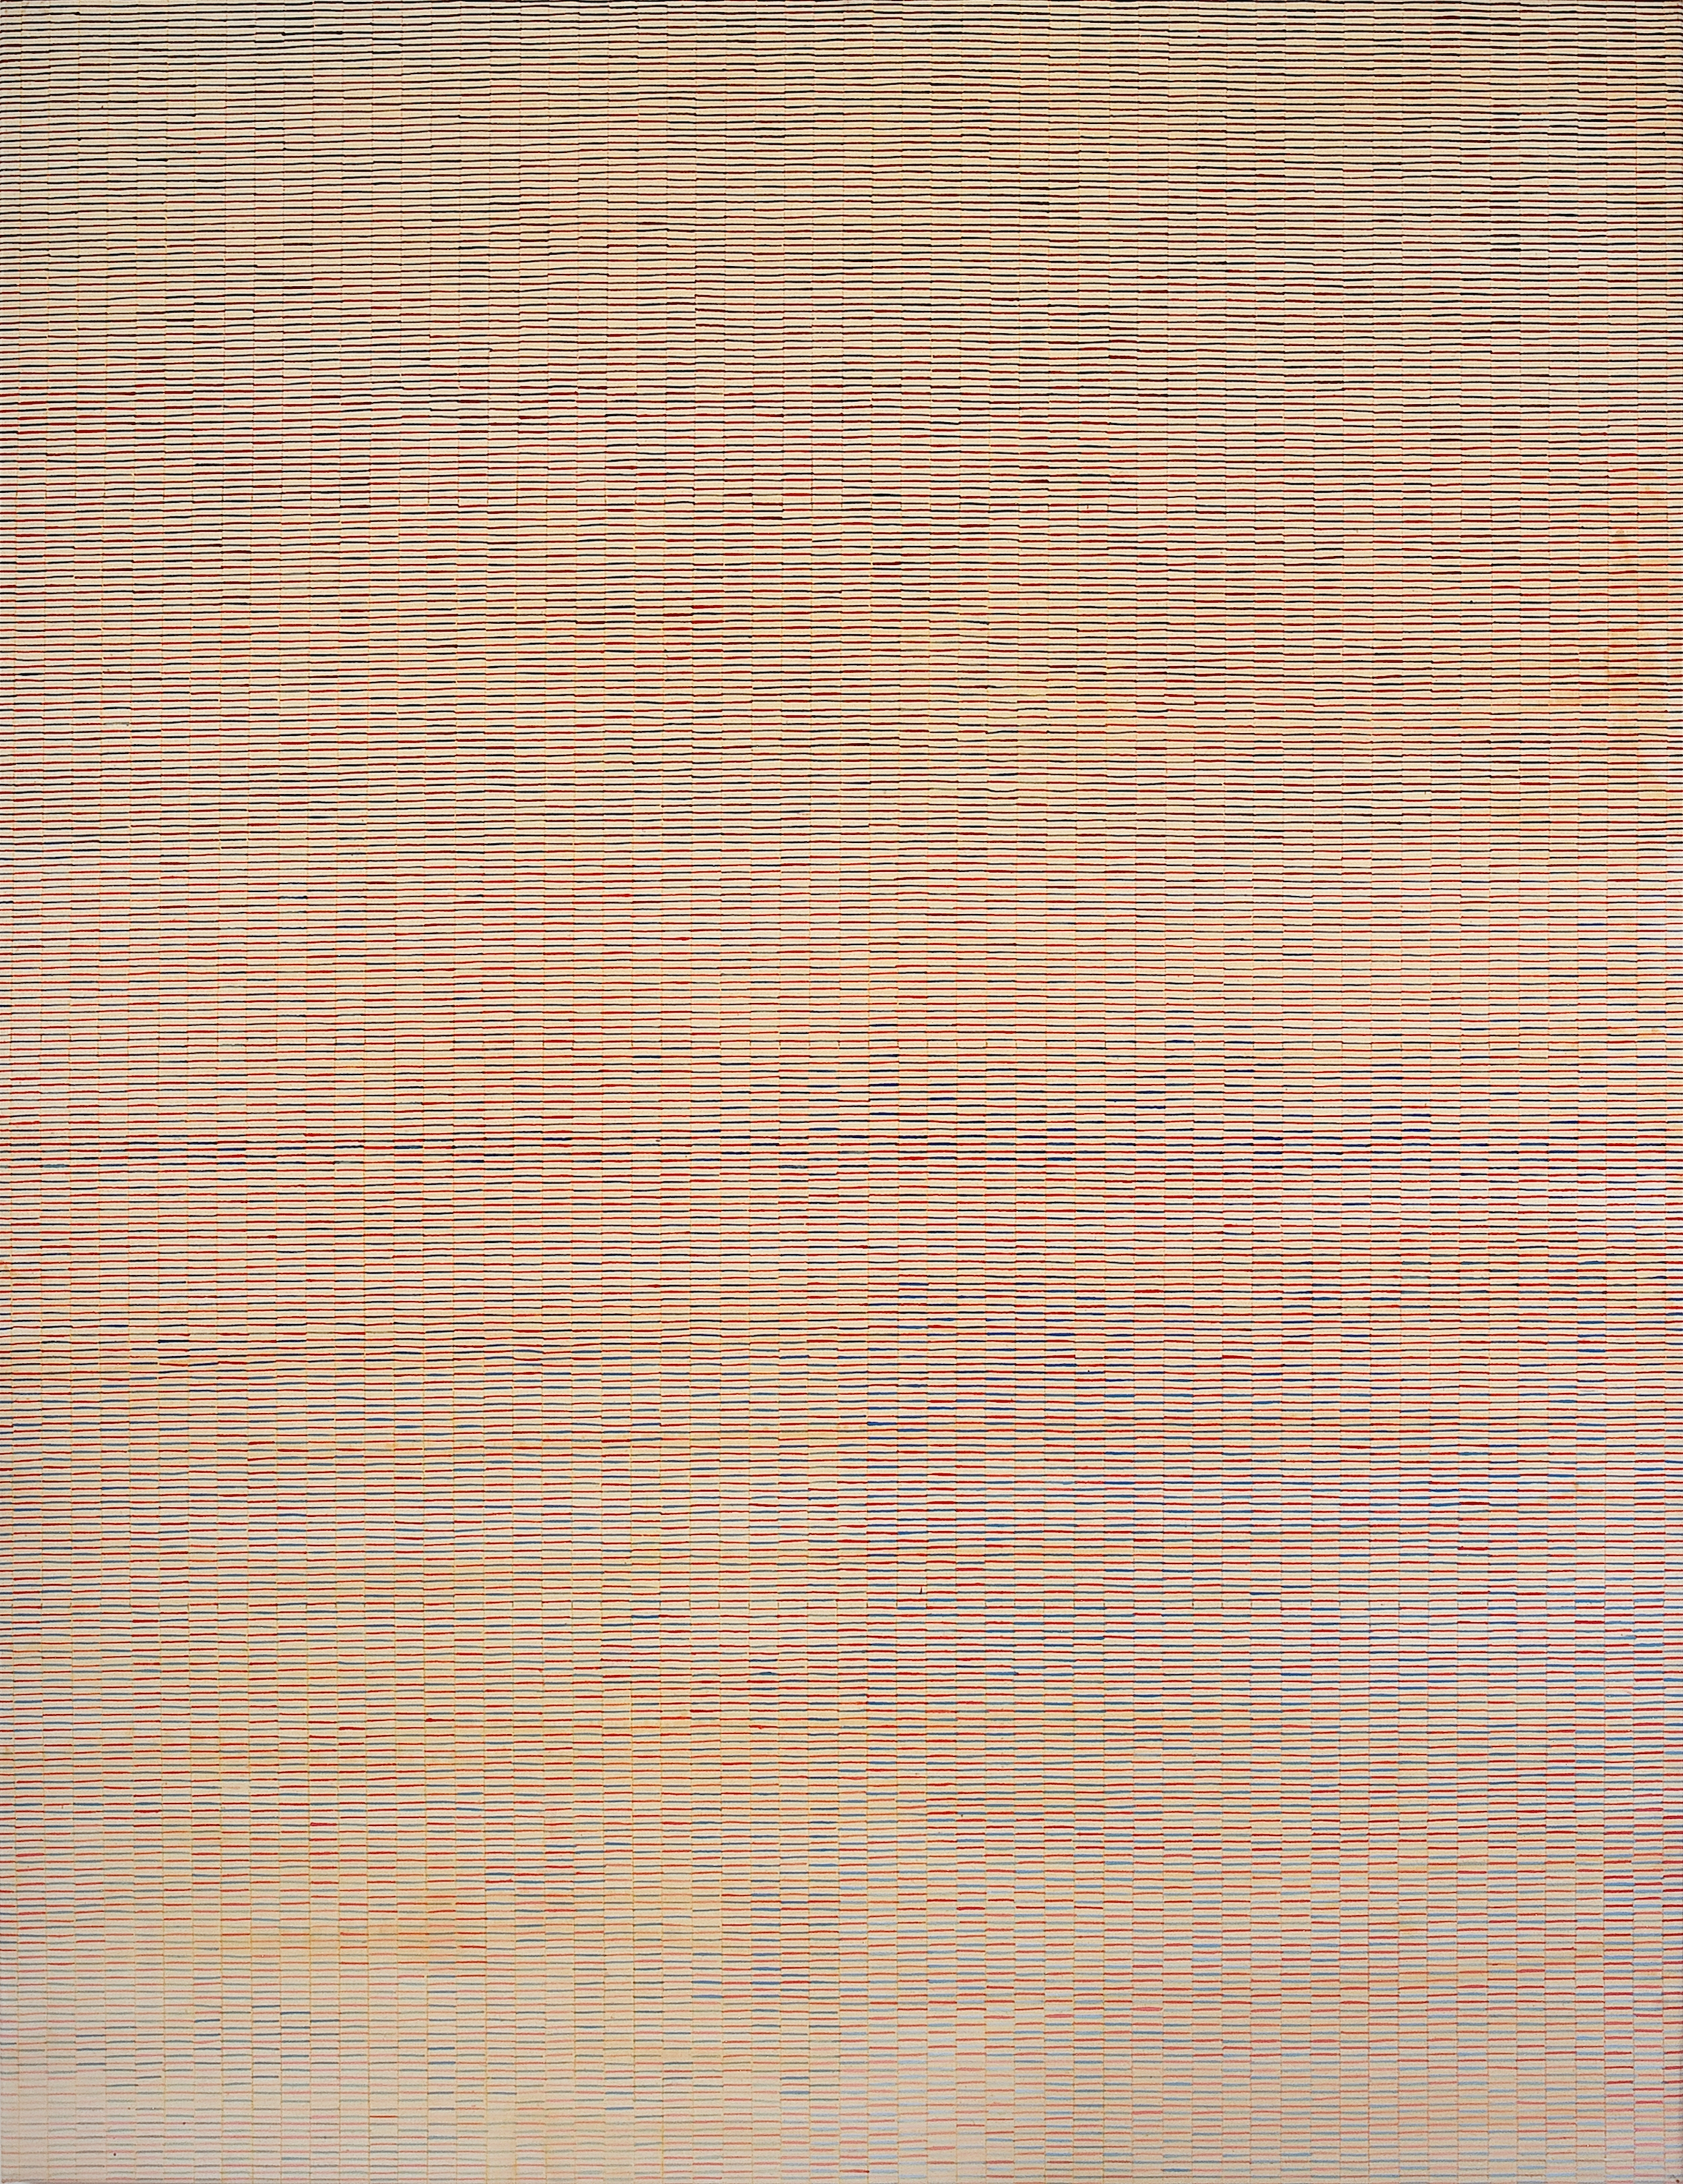 2009 Breathing Pattern #2. Acrlic on canvas, 1150x150cm  .jpg